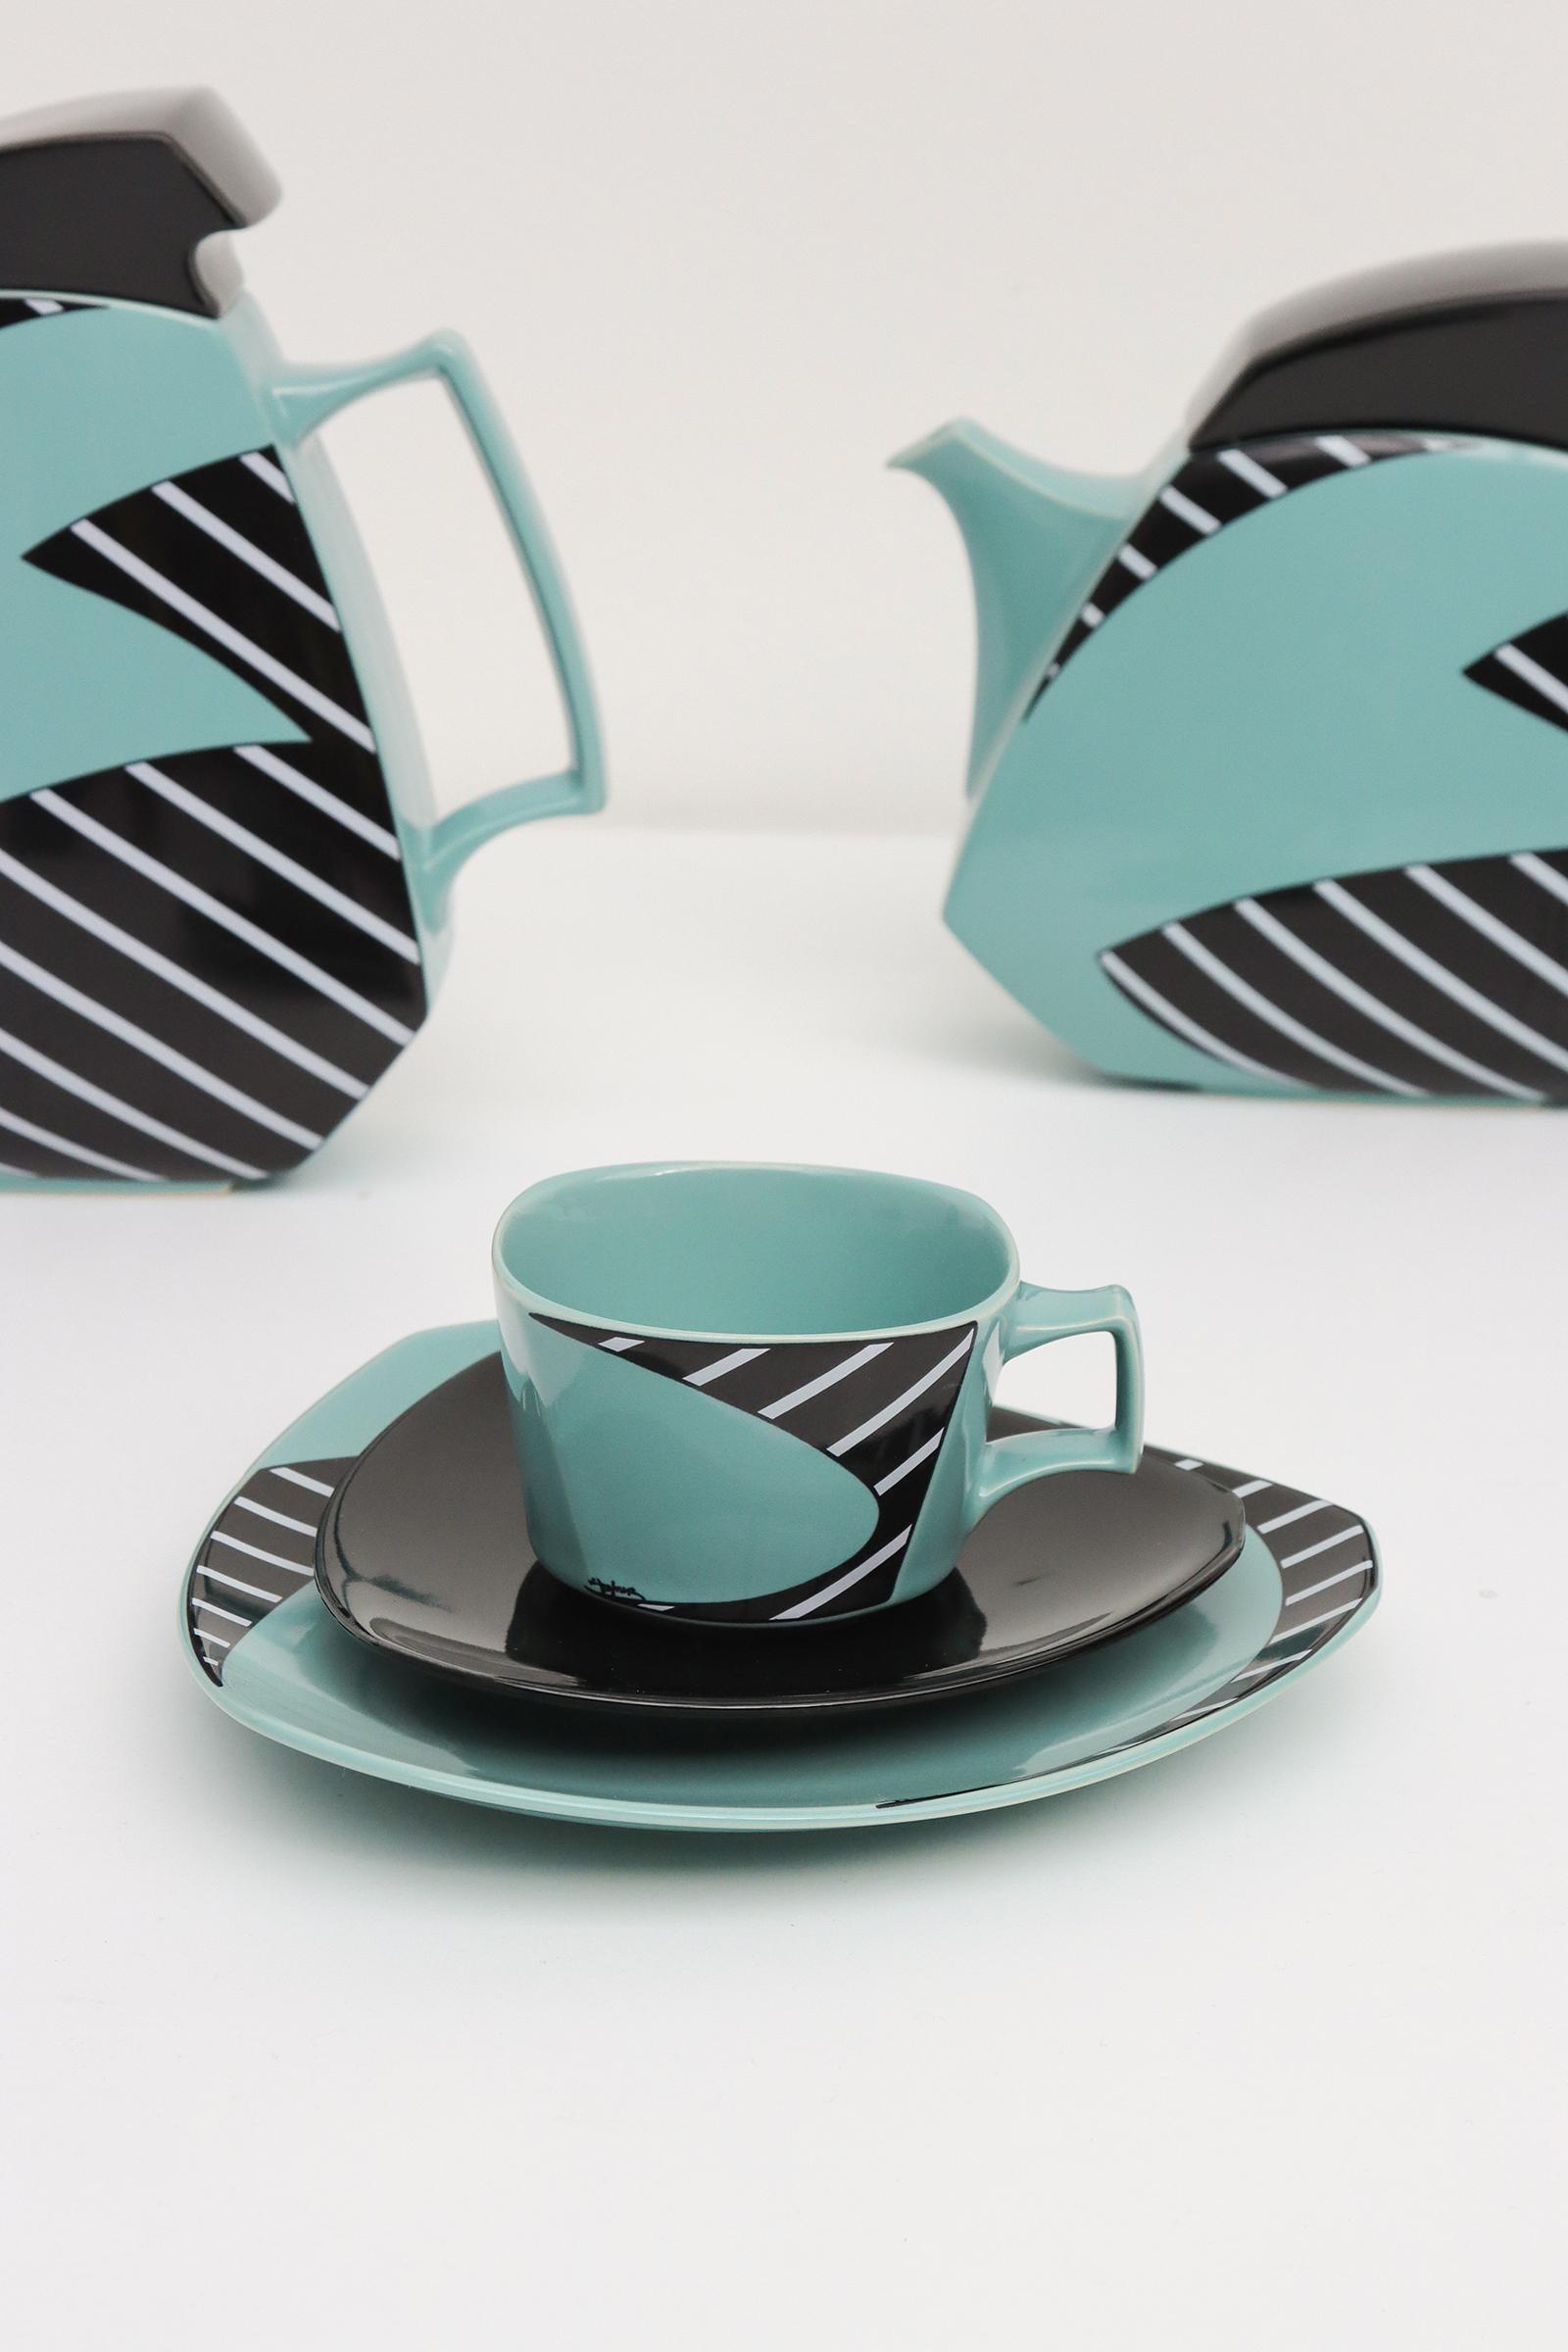 Flash Coffee and tea set by Dorothy Hafner for Rosenthalimage 5